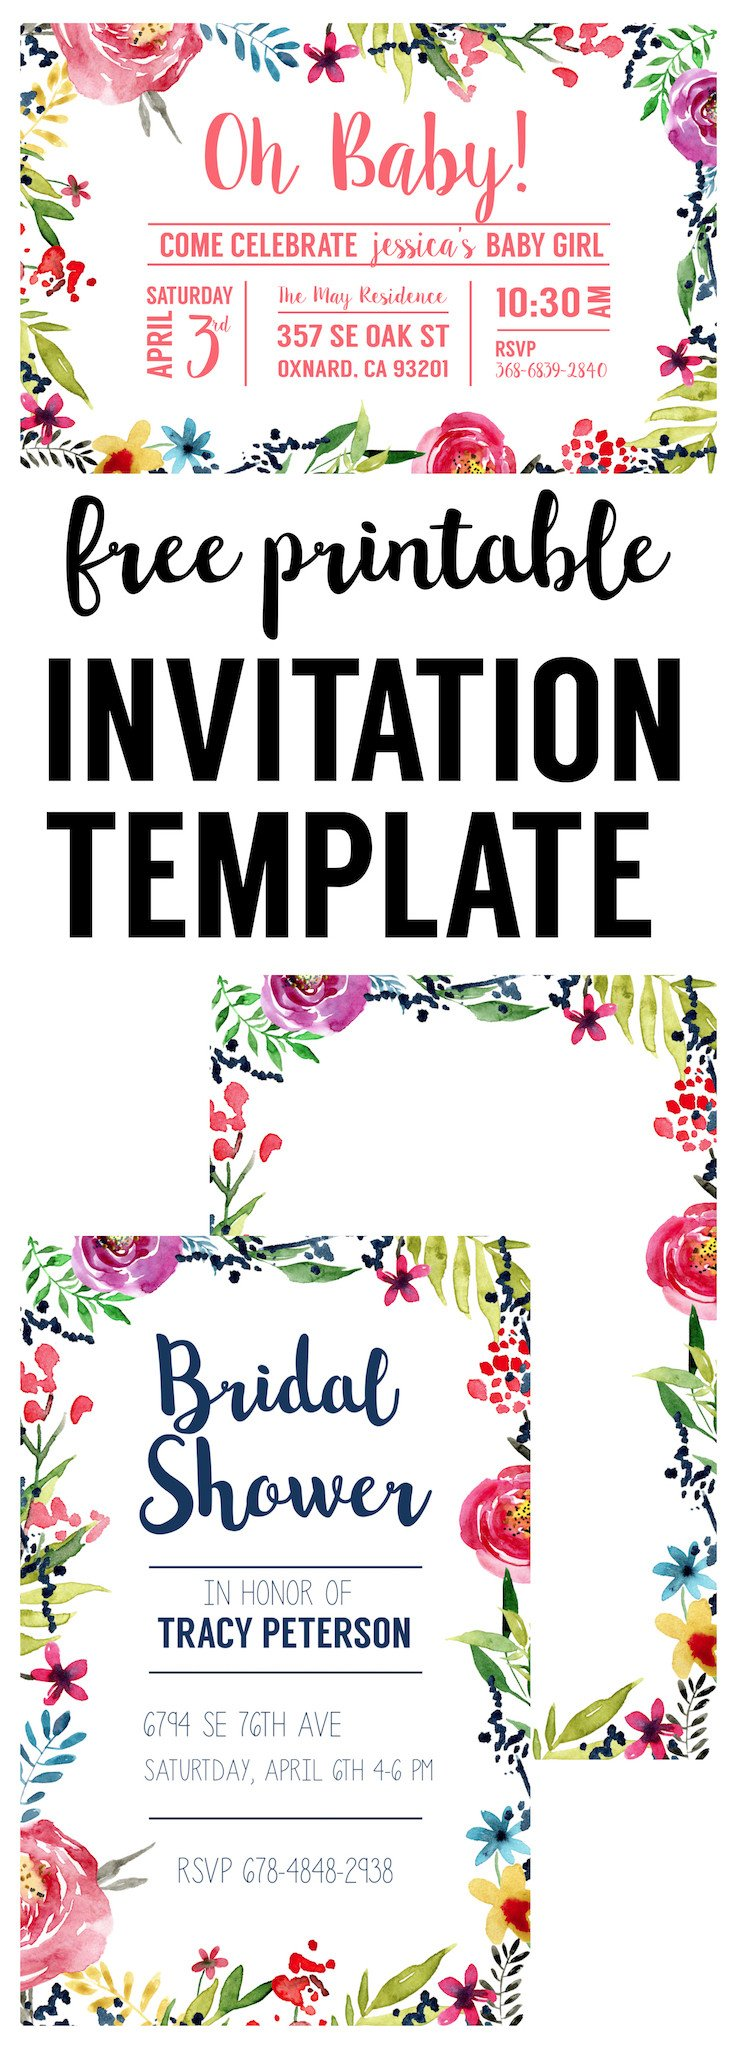 Free Printable Invitation Templates Floral Borders Invitations Free Printable Invitation